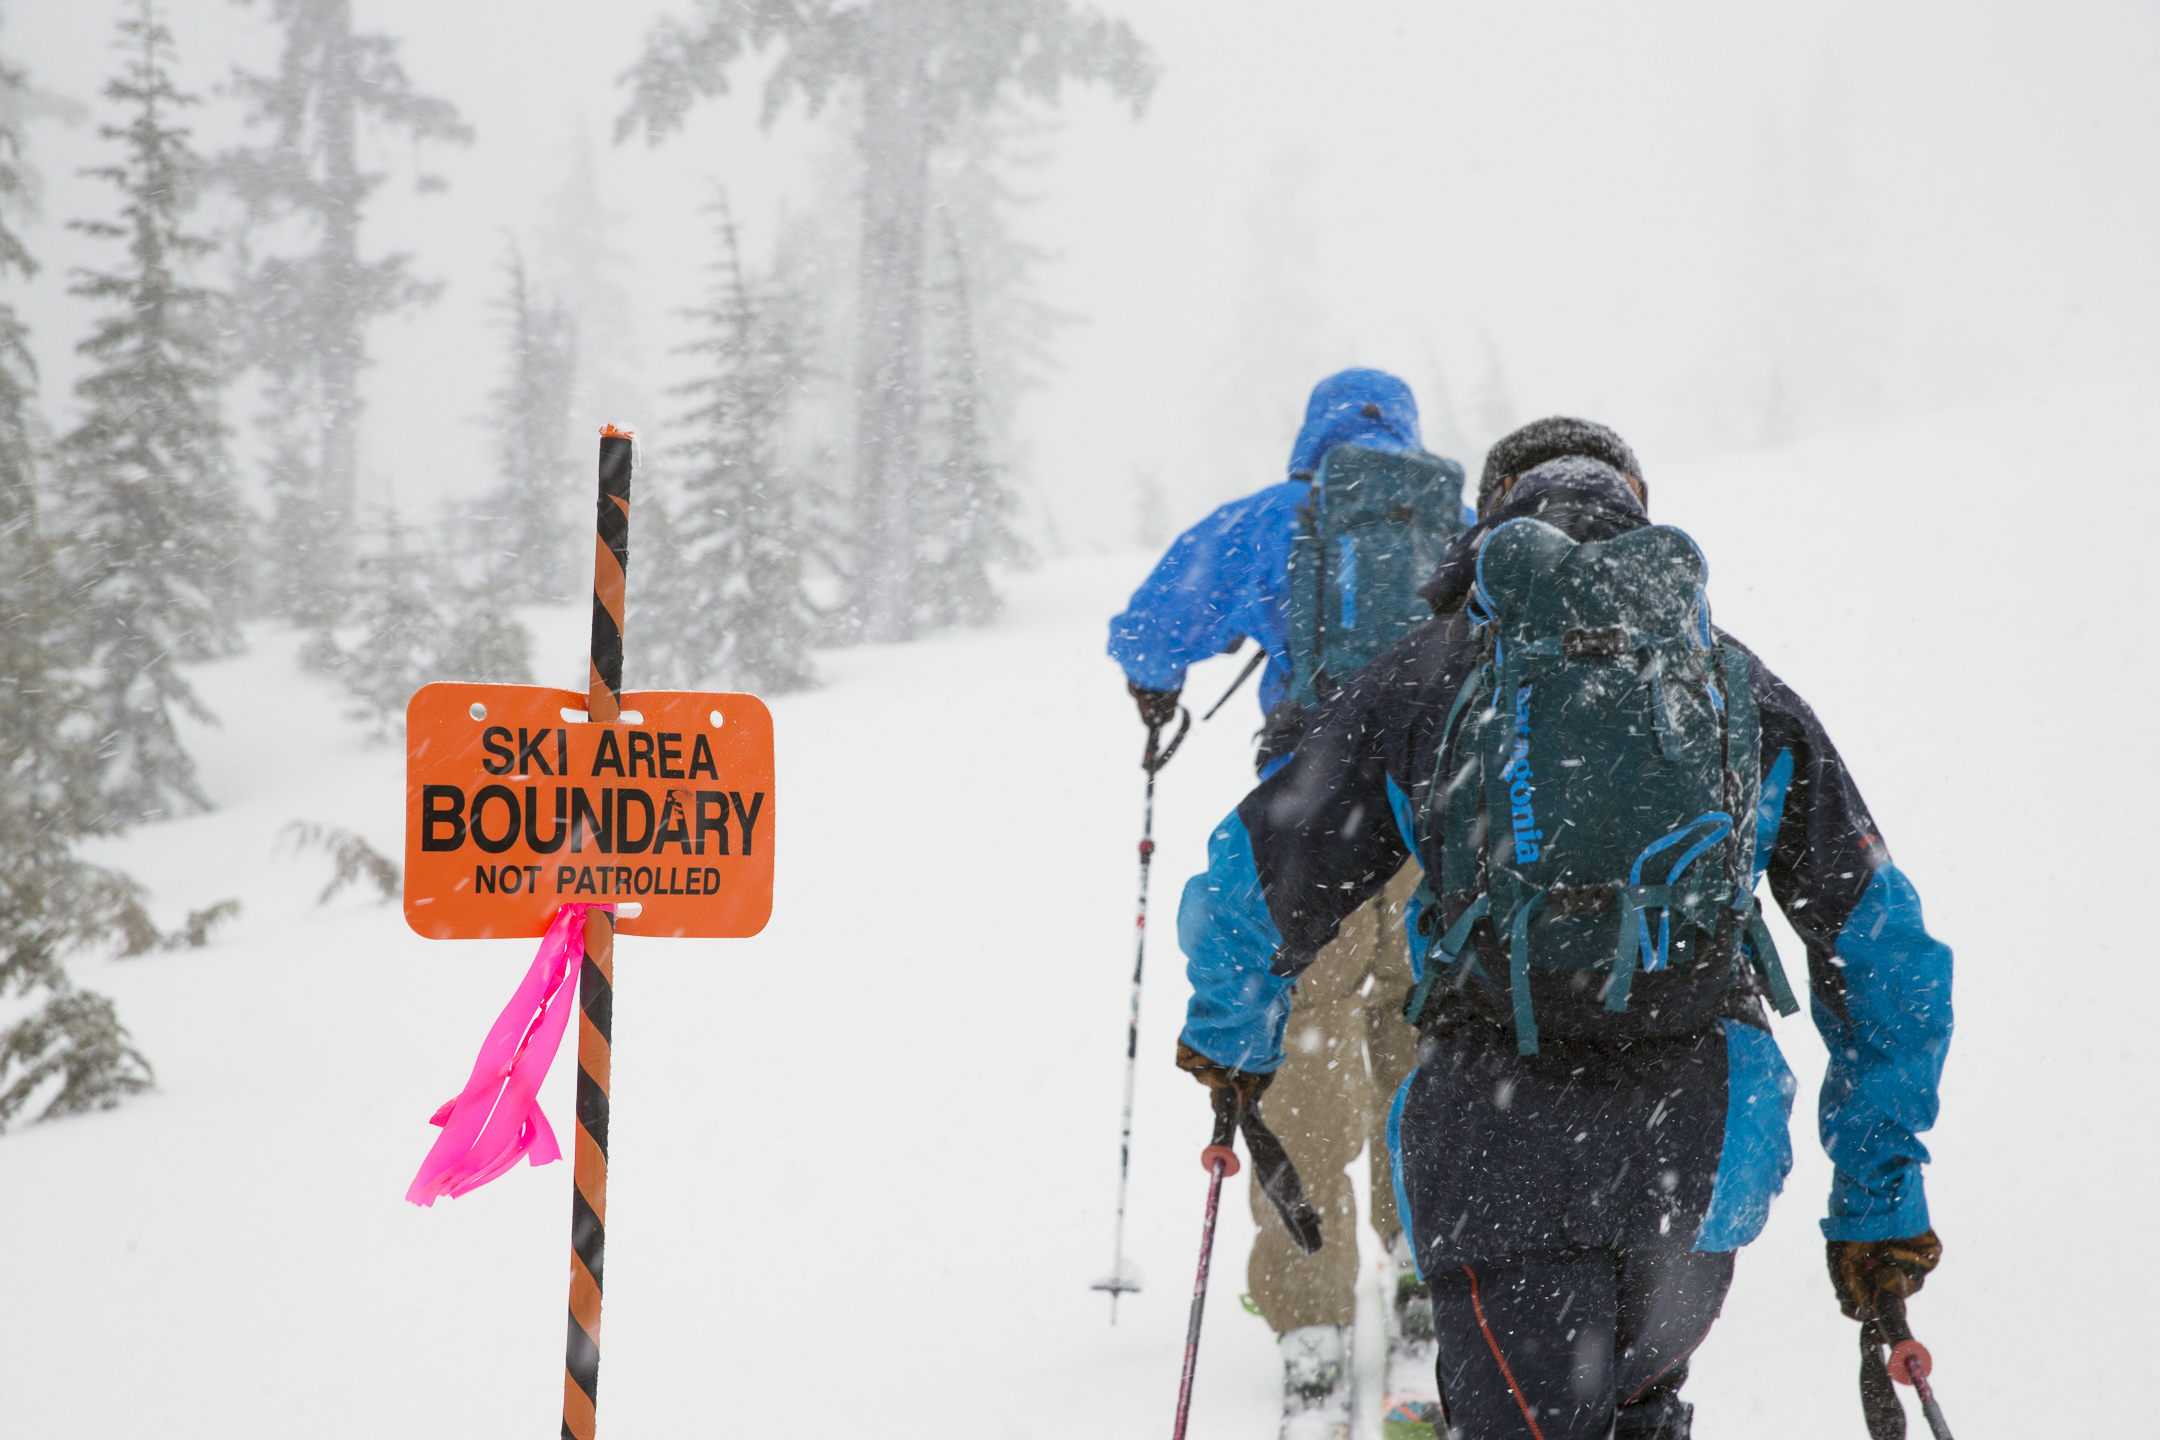 Eliel Hindert Mt Cain Alpine Park Vancouver Island, British Columbia www.jaybeyer.com jay@jaybeyer.com 801-891-0838